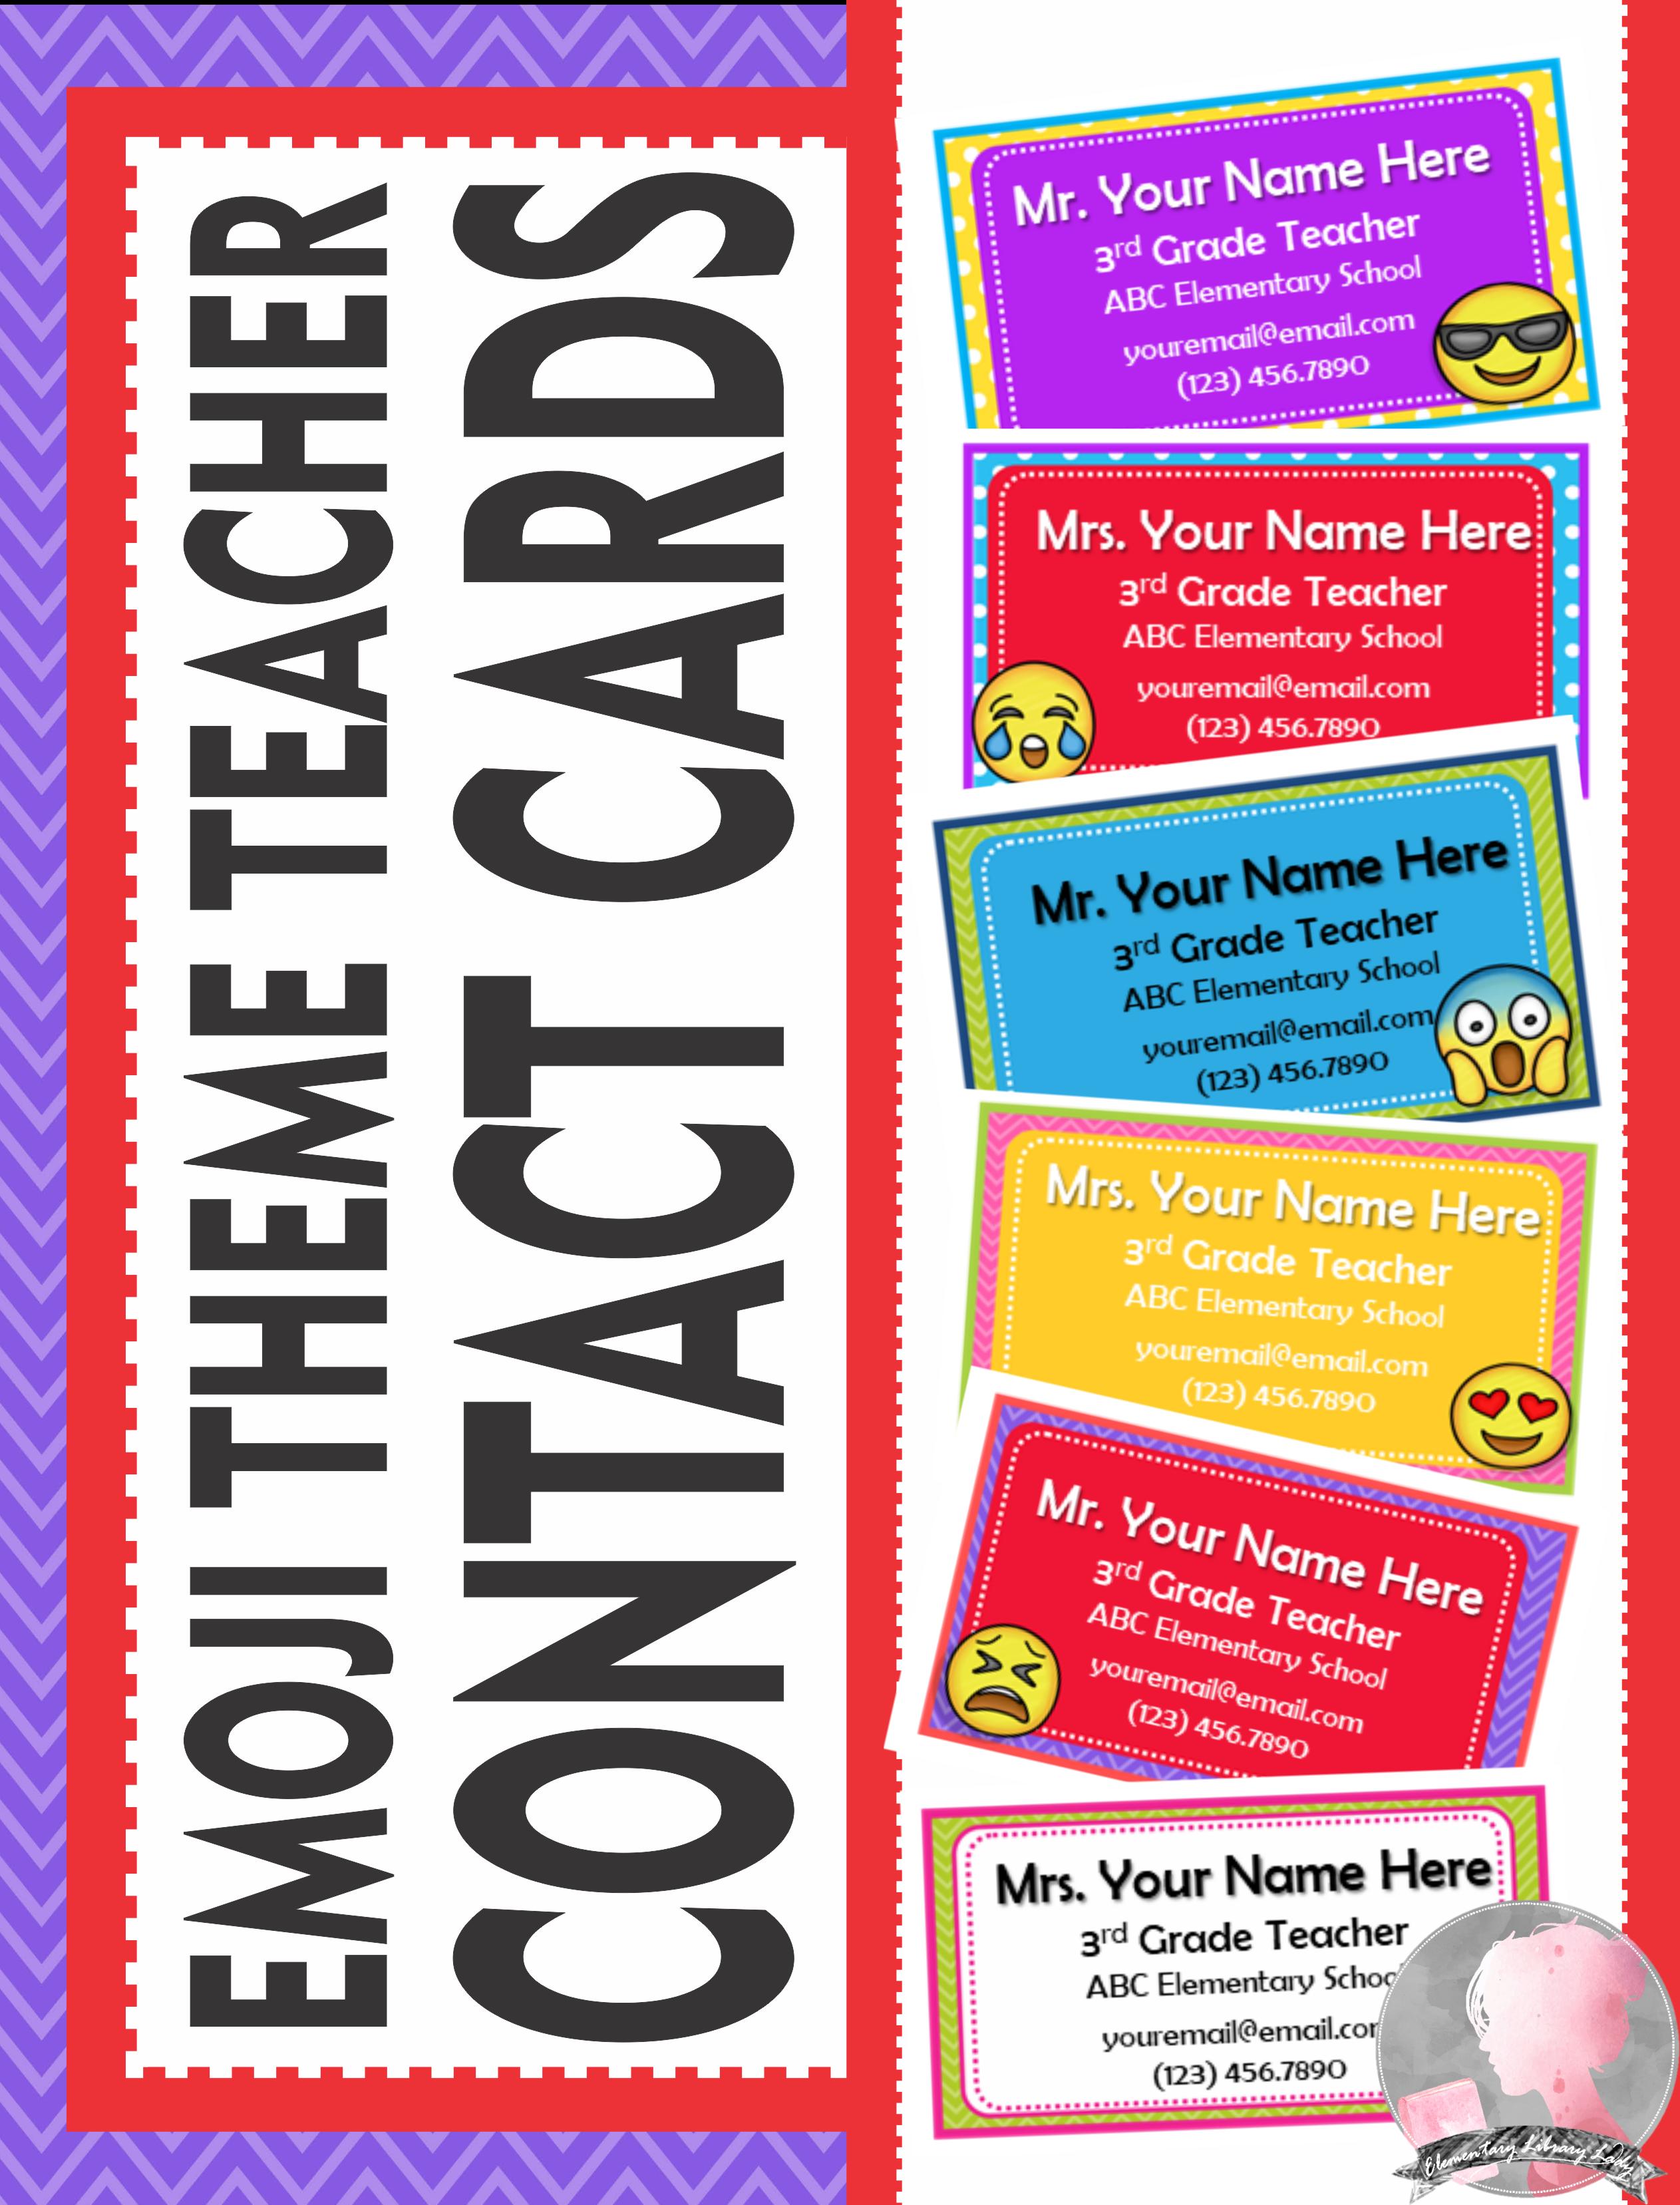 Teacher Contact Cards for Parents Introduction Emoji Theme